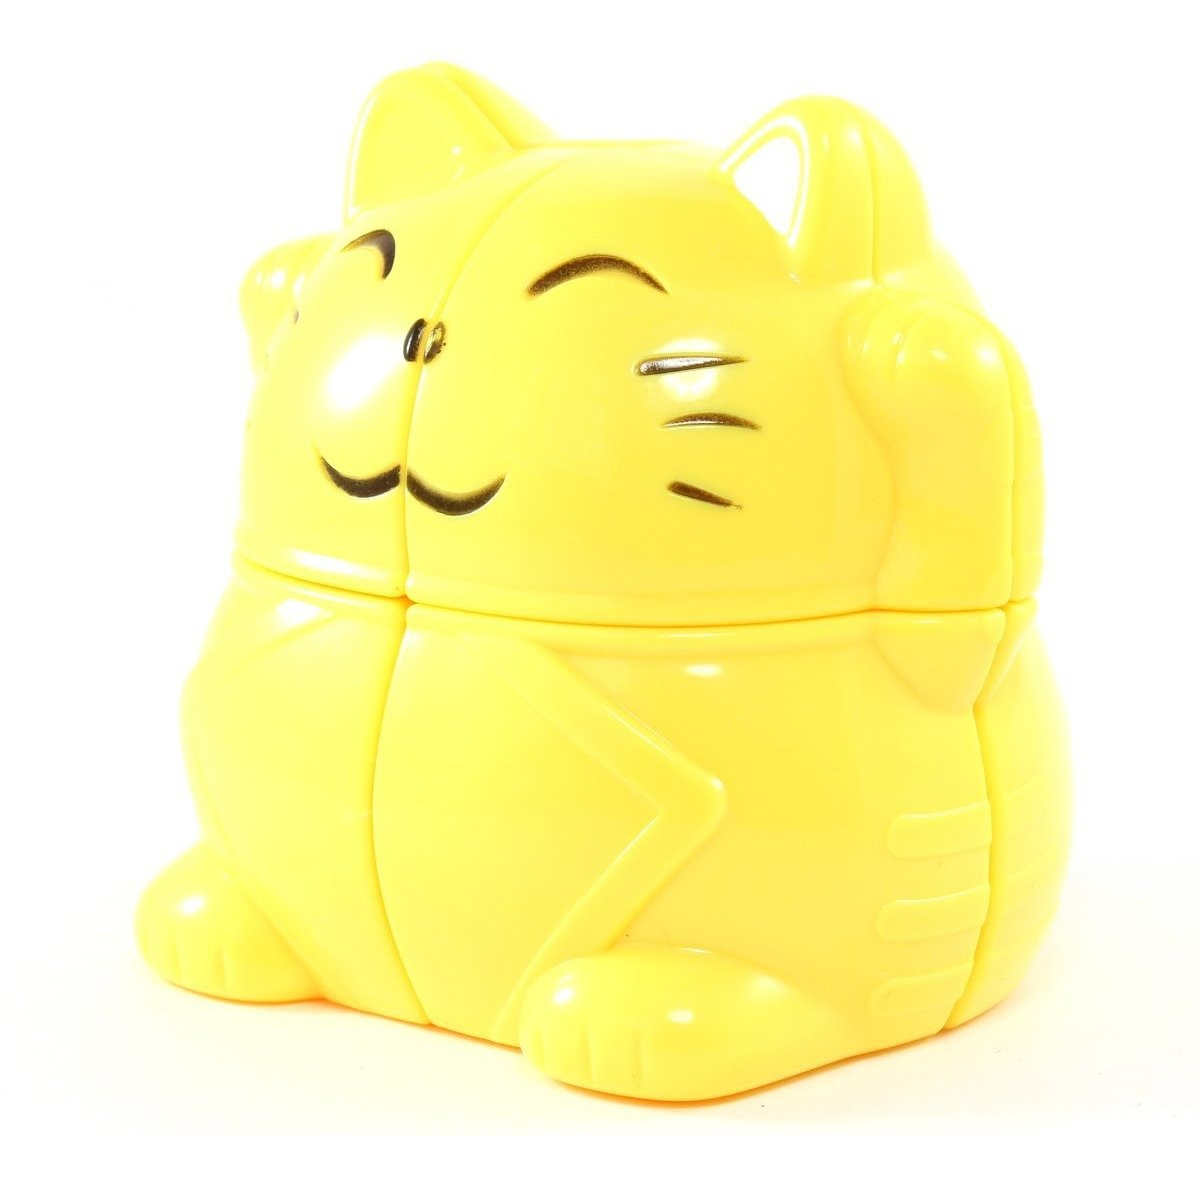 Cubo Rubik 2x2 Yj Cat , Gato , Envio Y Base Gratis